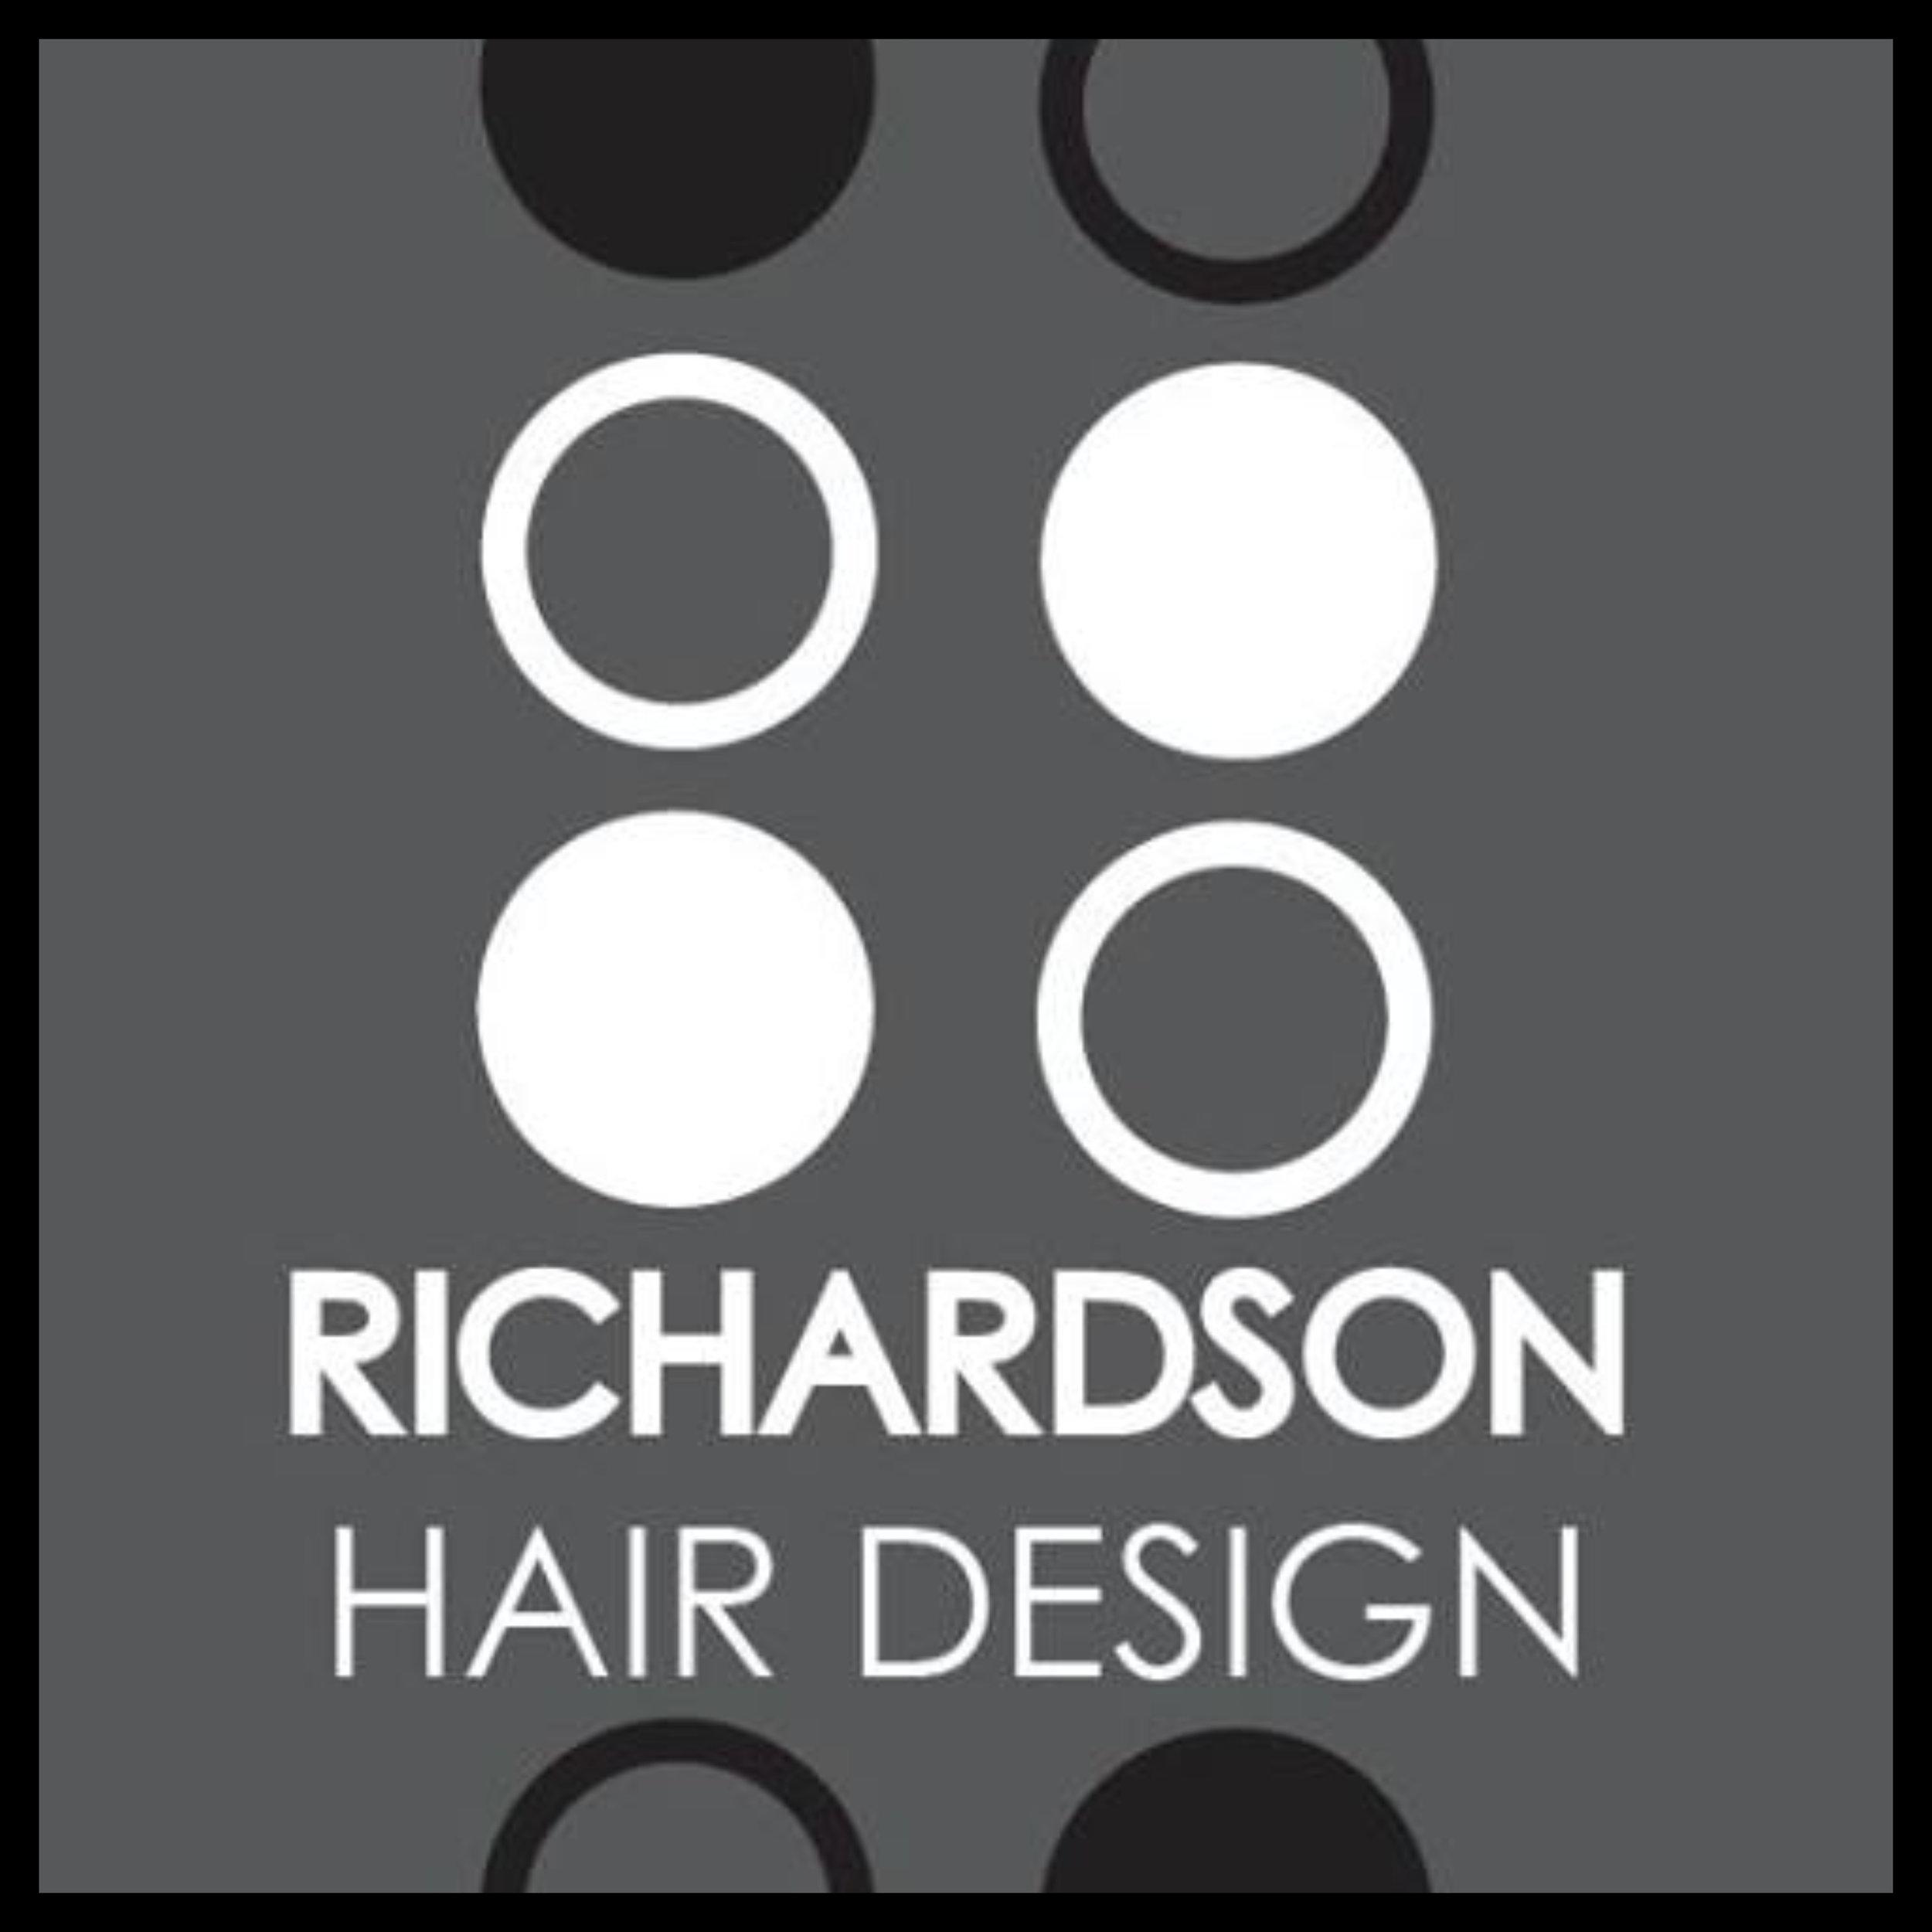 RichardsonHDSQ.jpg